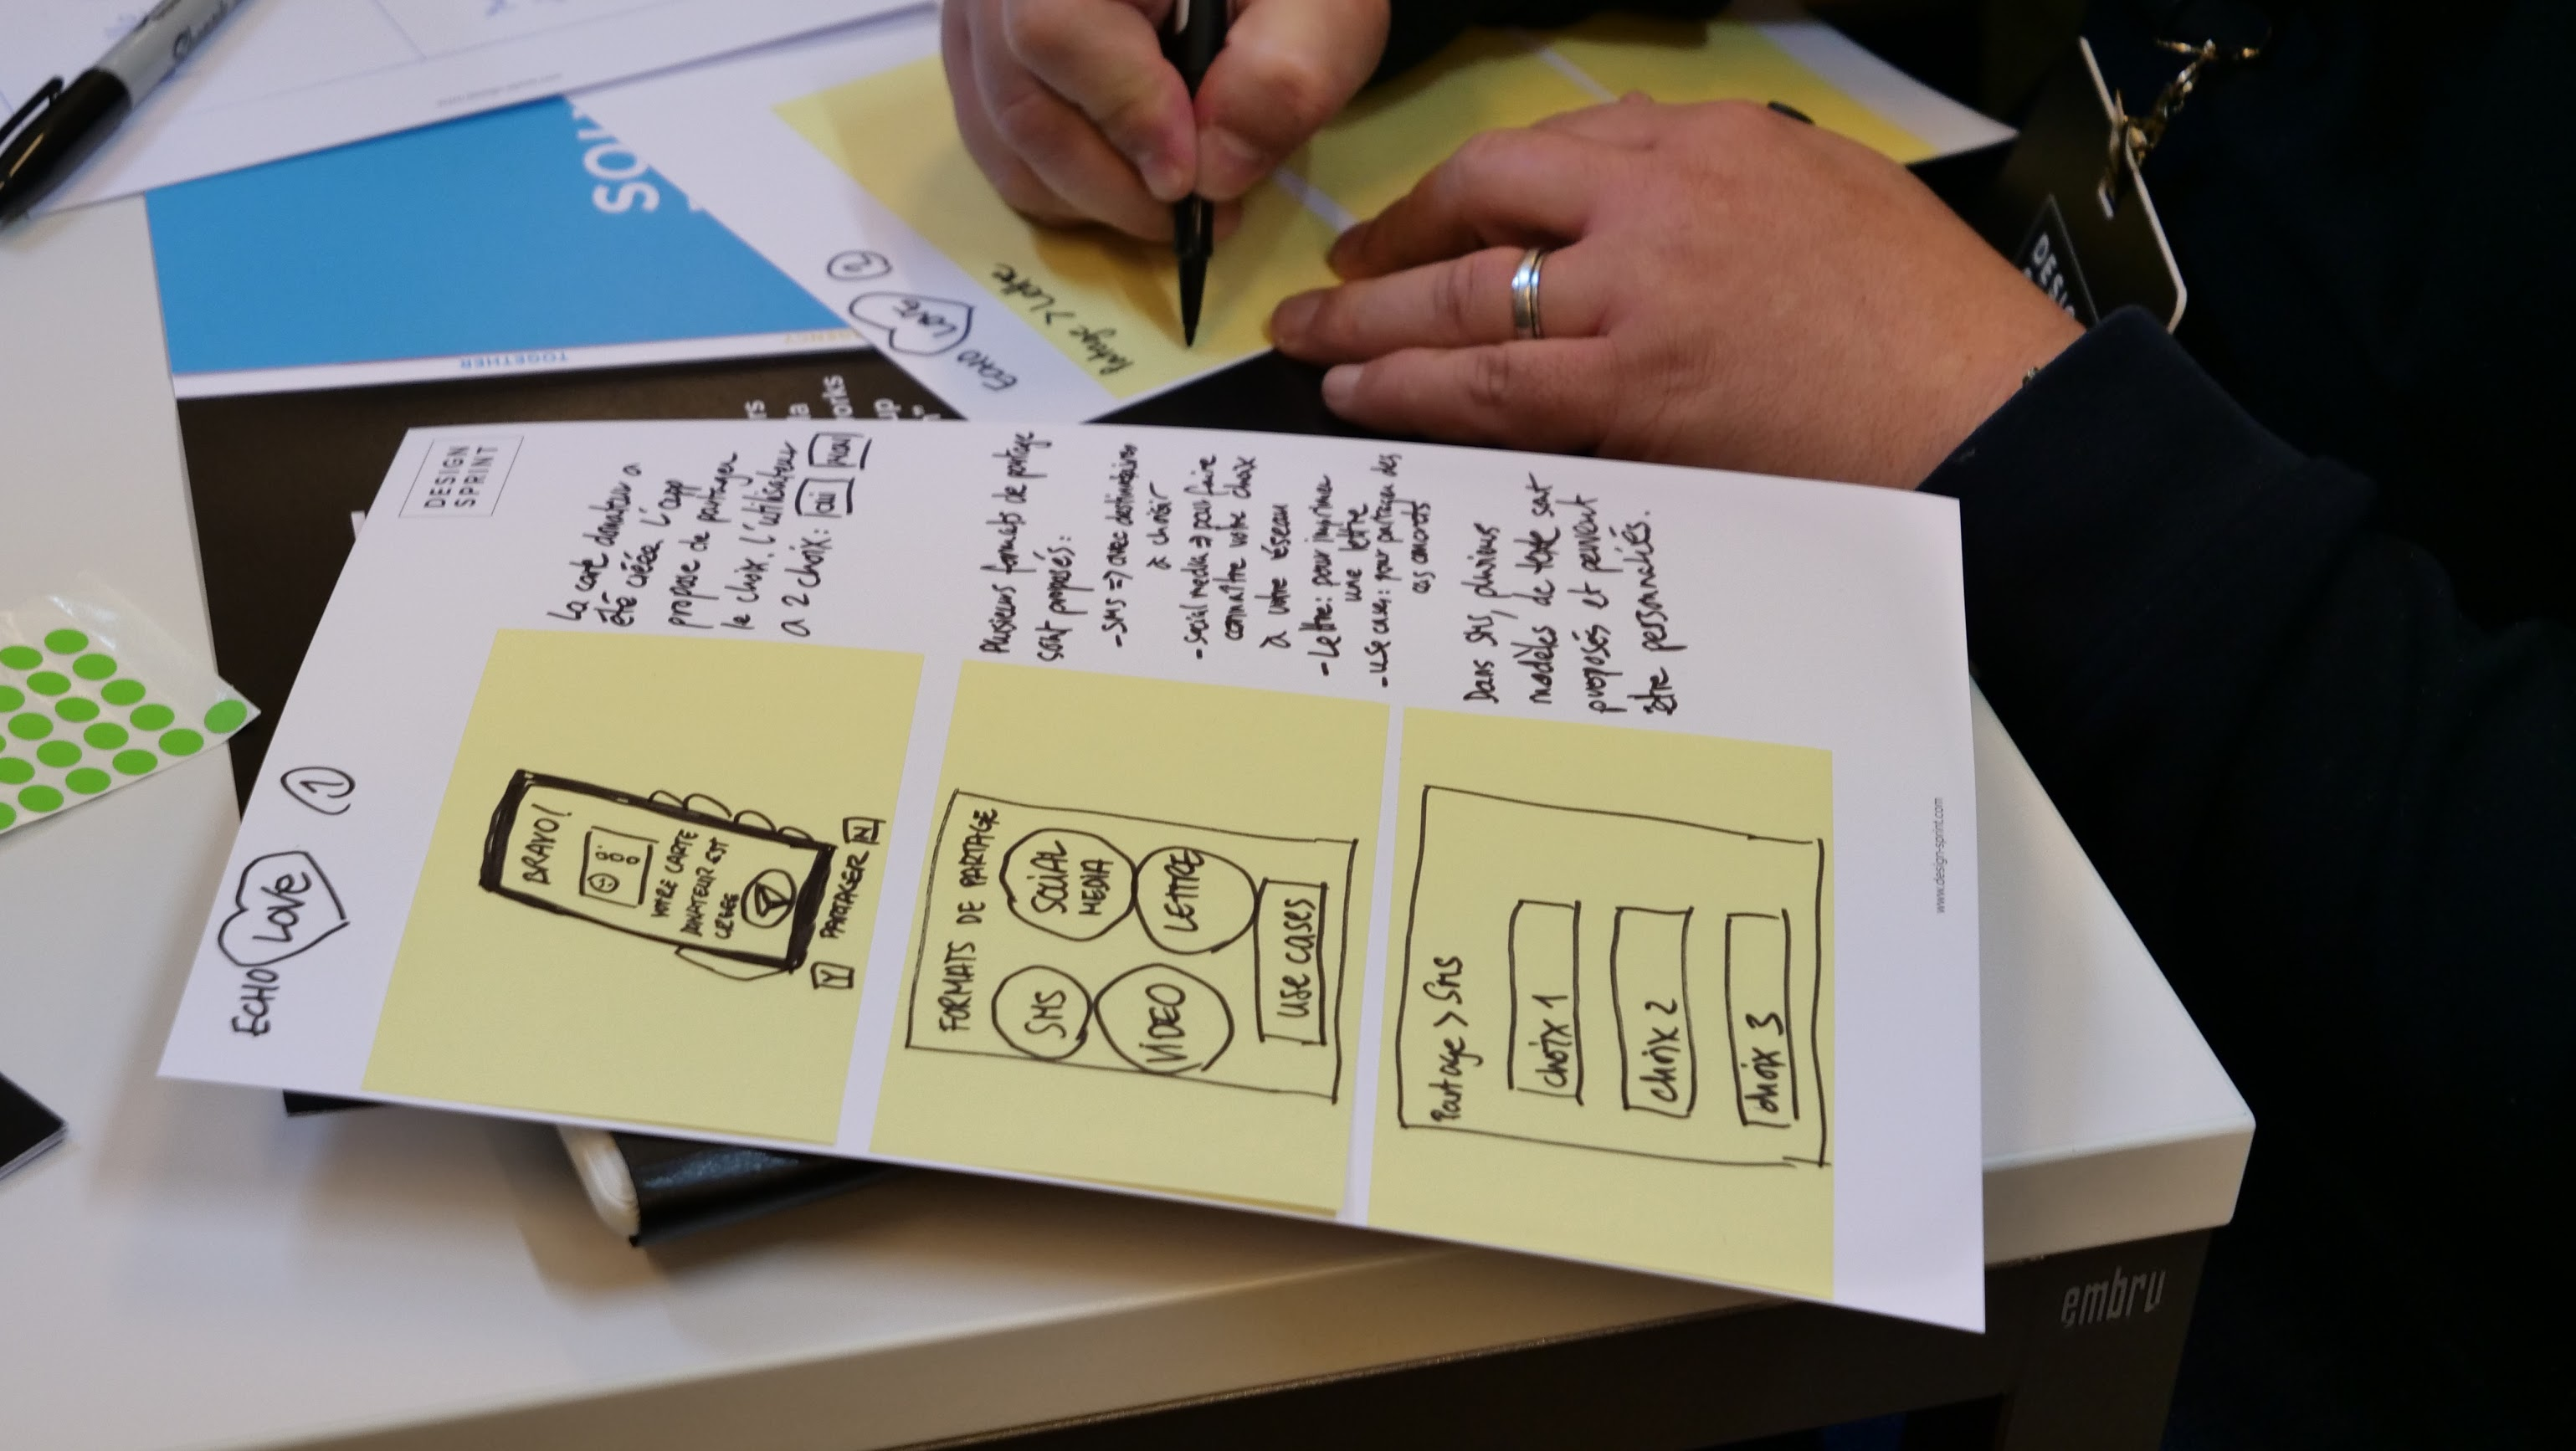 Design Sprint Masterclass Sketch